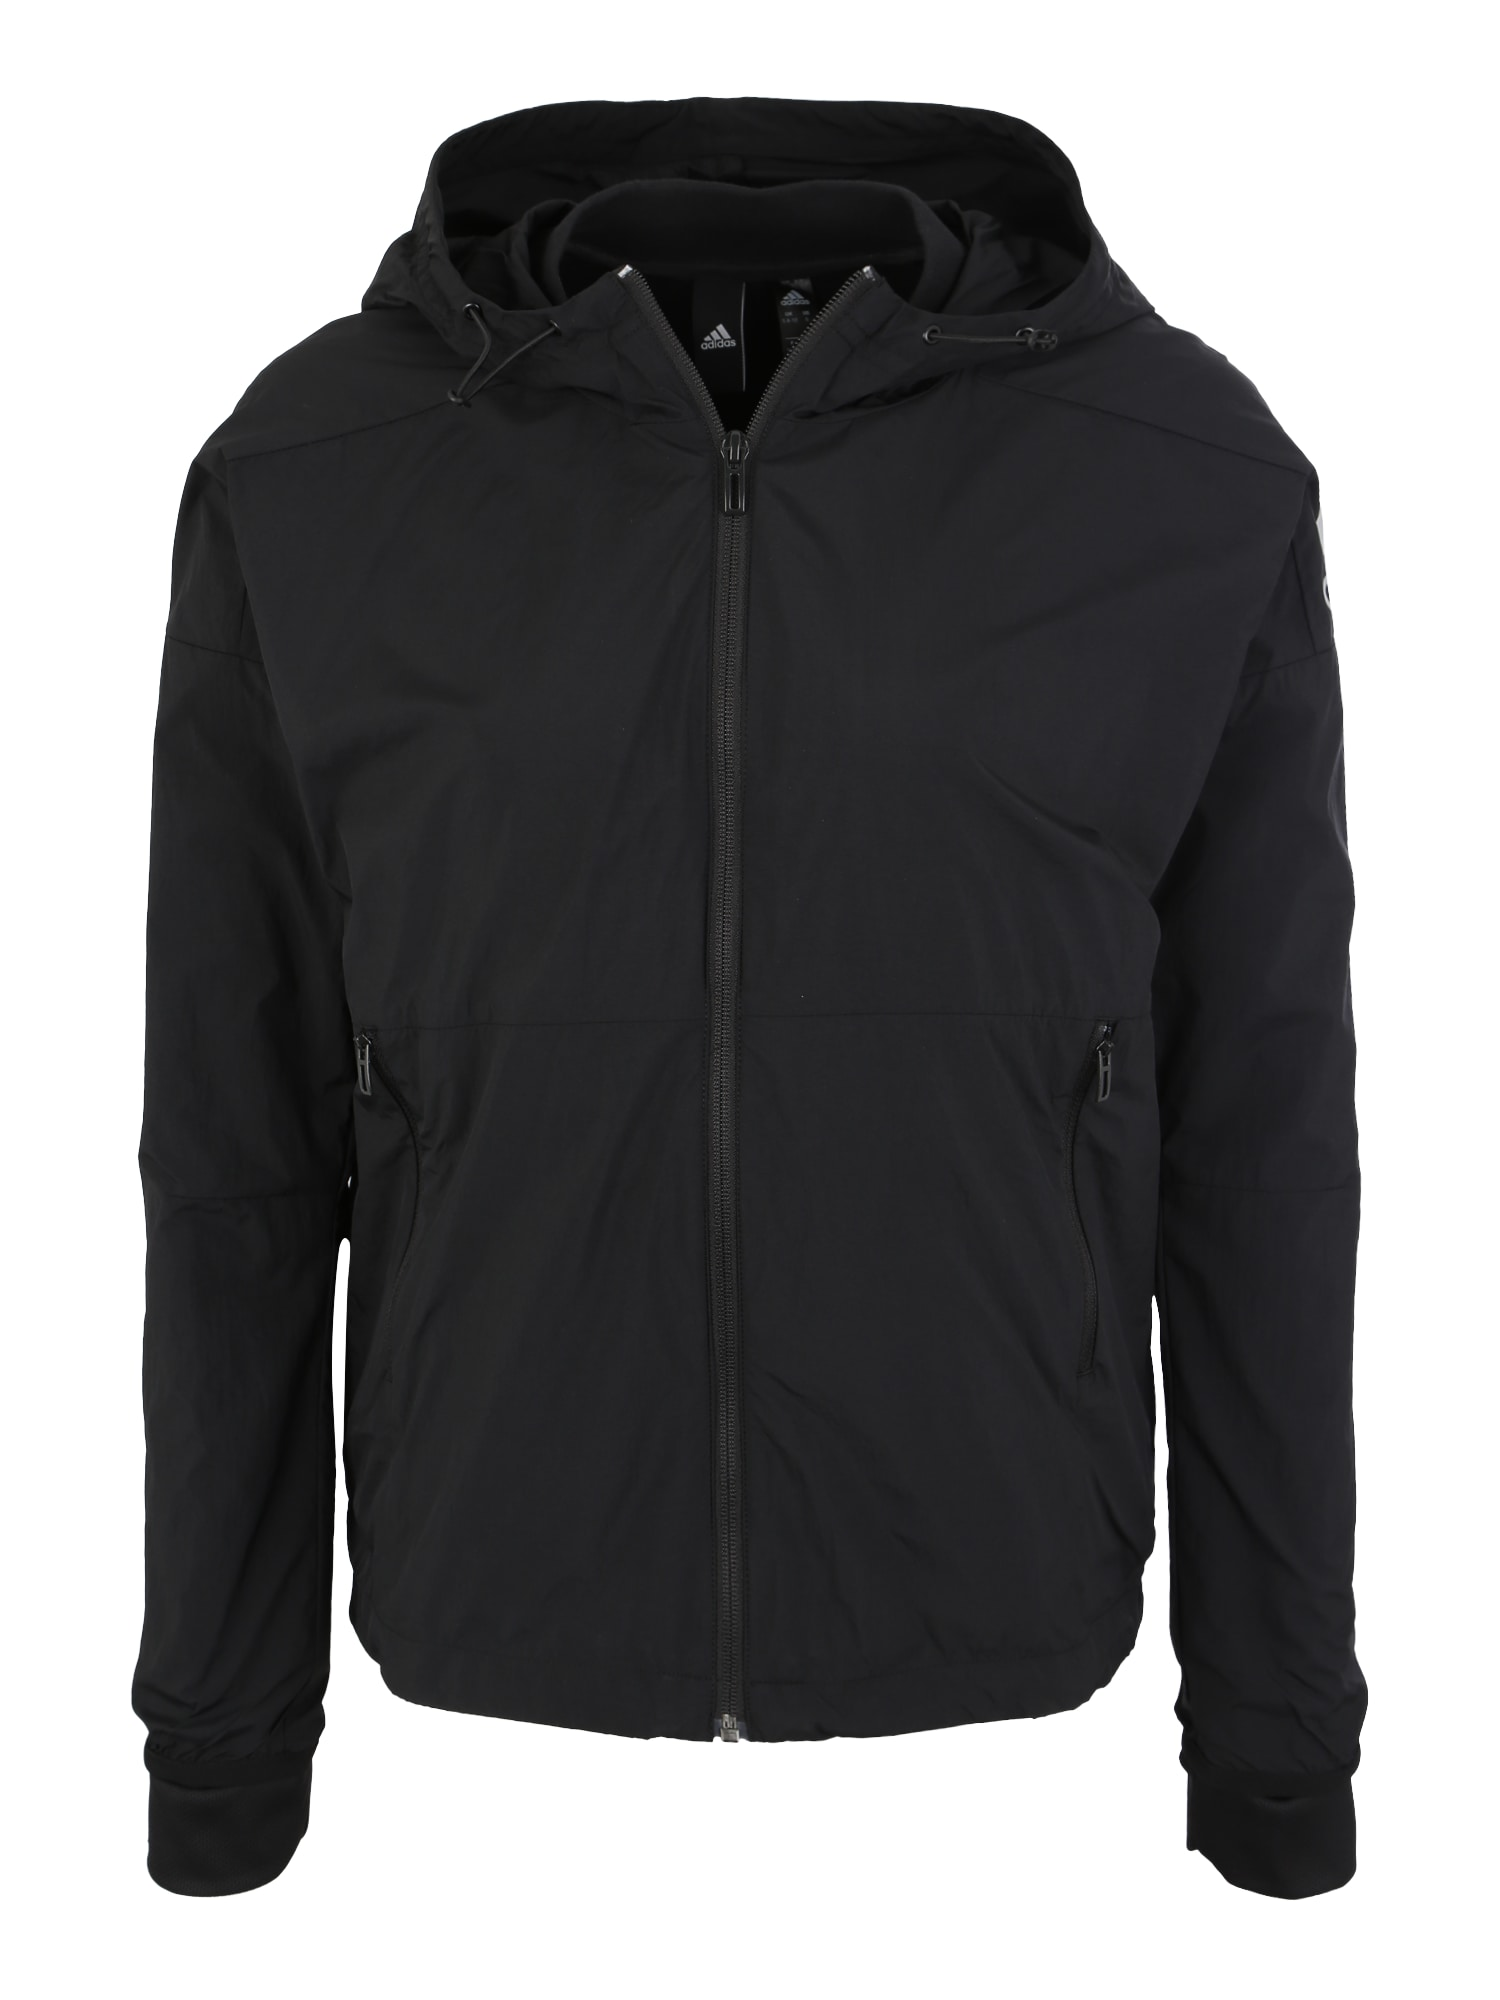 Outdoorová bunda W Id 2in1 Jkt černá ADIDAS PERFORMANCE